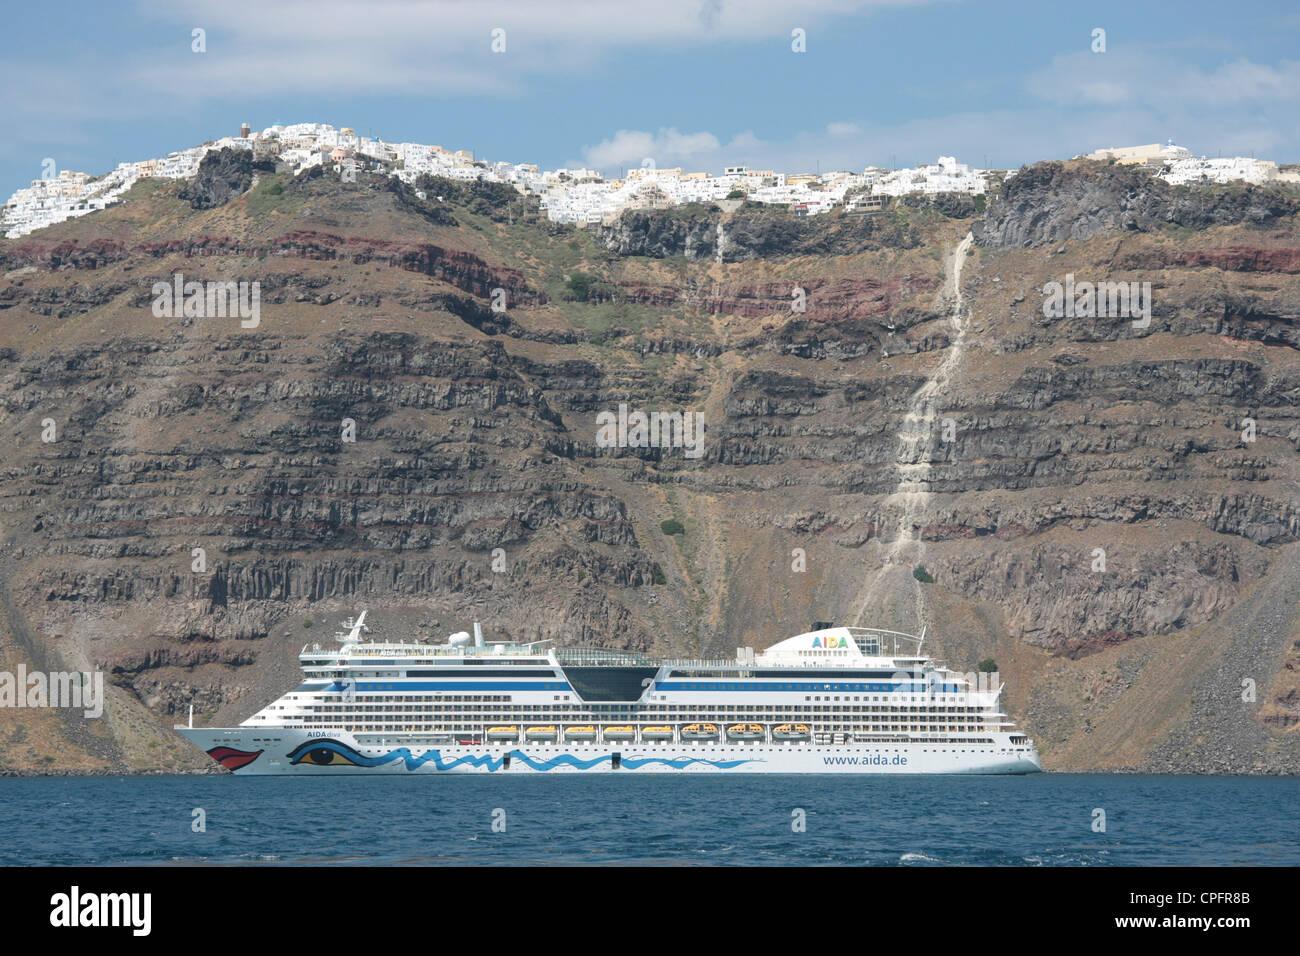 Cruise ship AIDA diva at anchor in Santorini - Stock Image